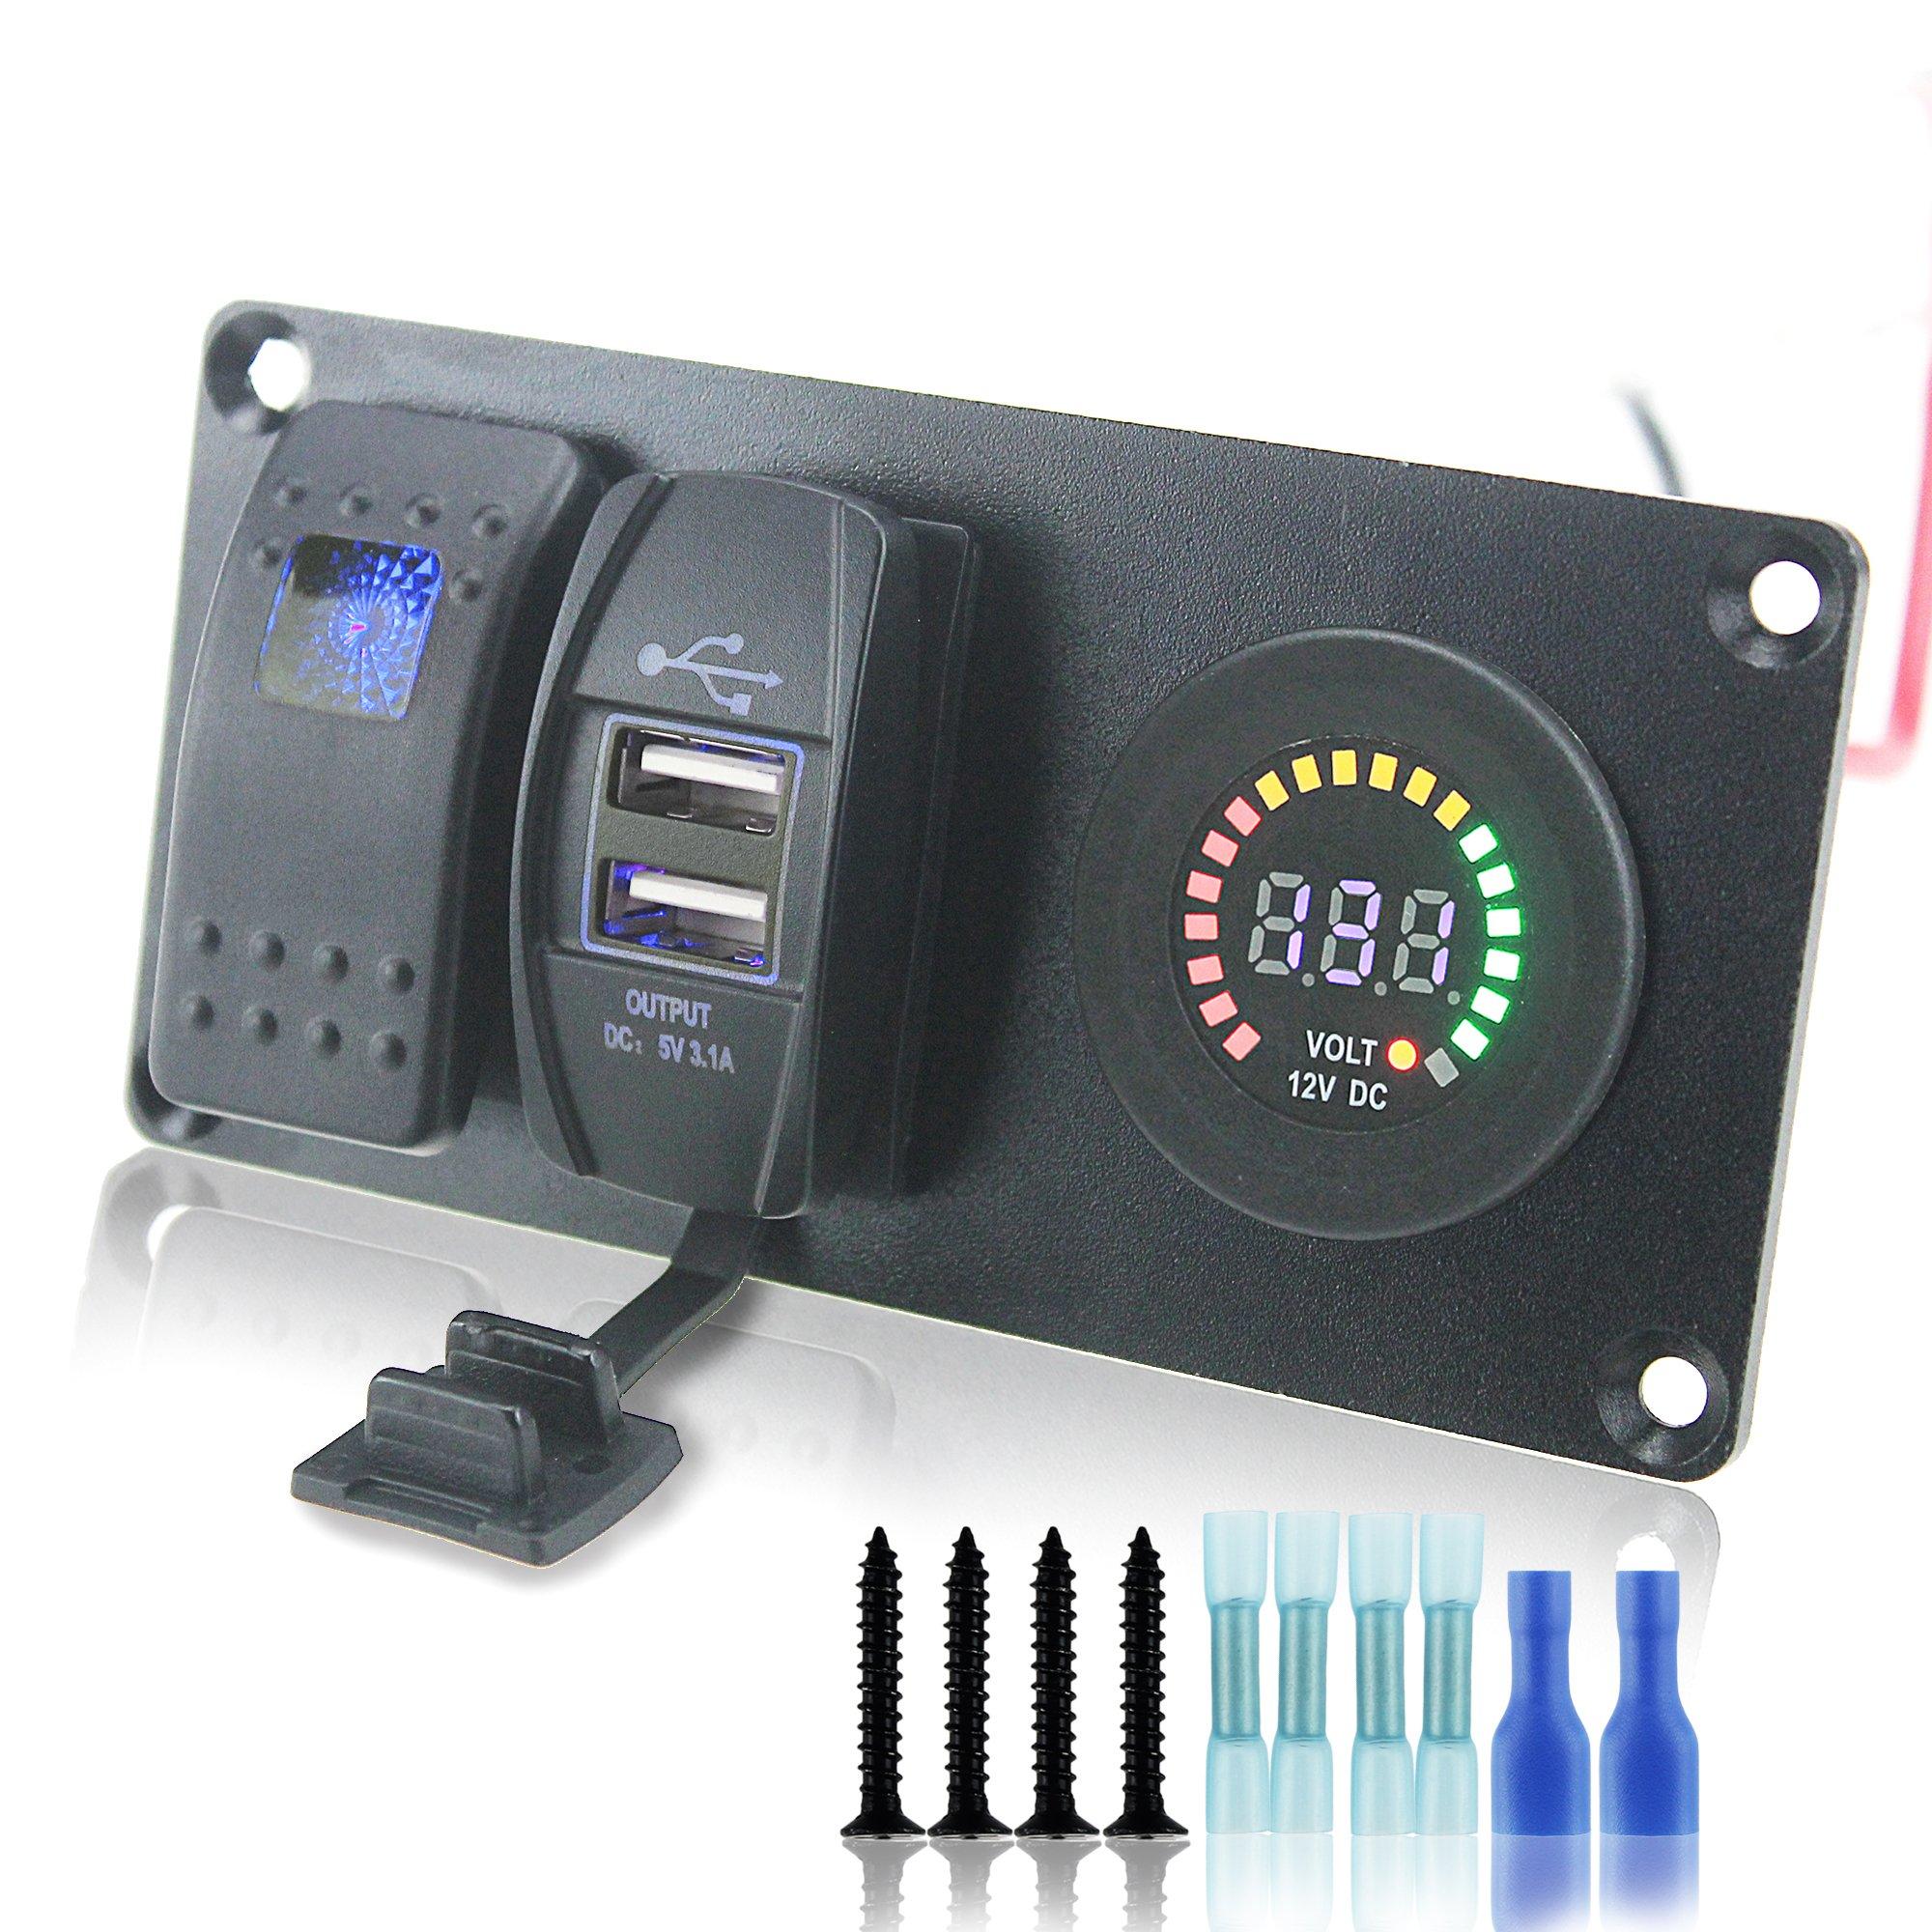 Iztor DC 12V Push Rocker Switch & 3.1A USB & voltmeter socket blue Indicator aluminum panel for Cars Trucks ATVs by iztor